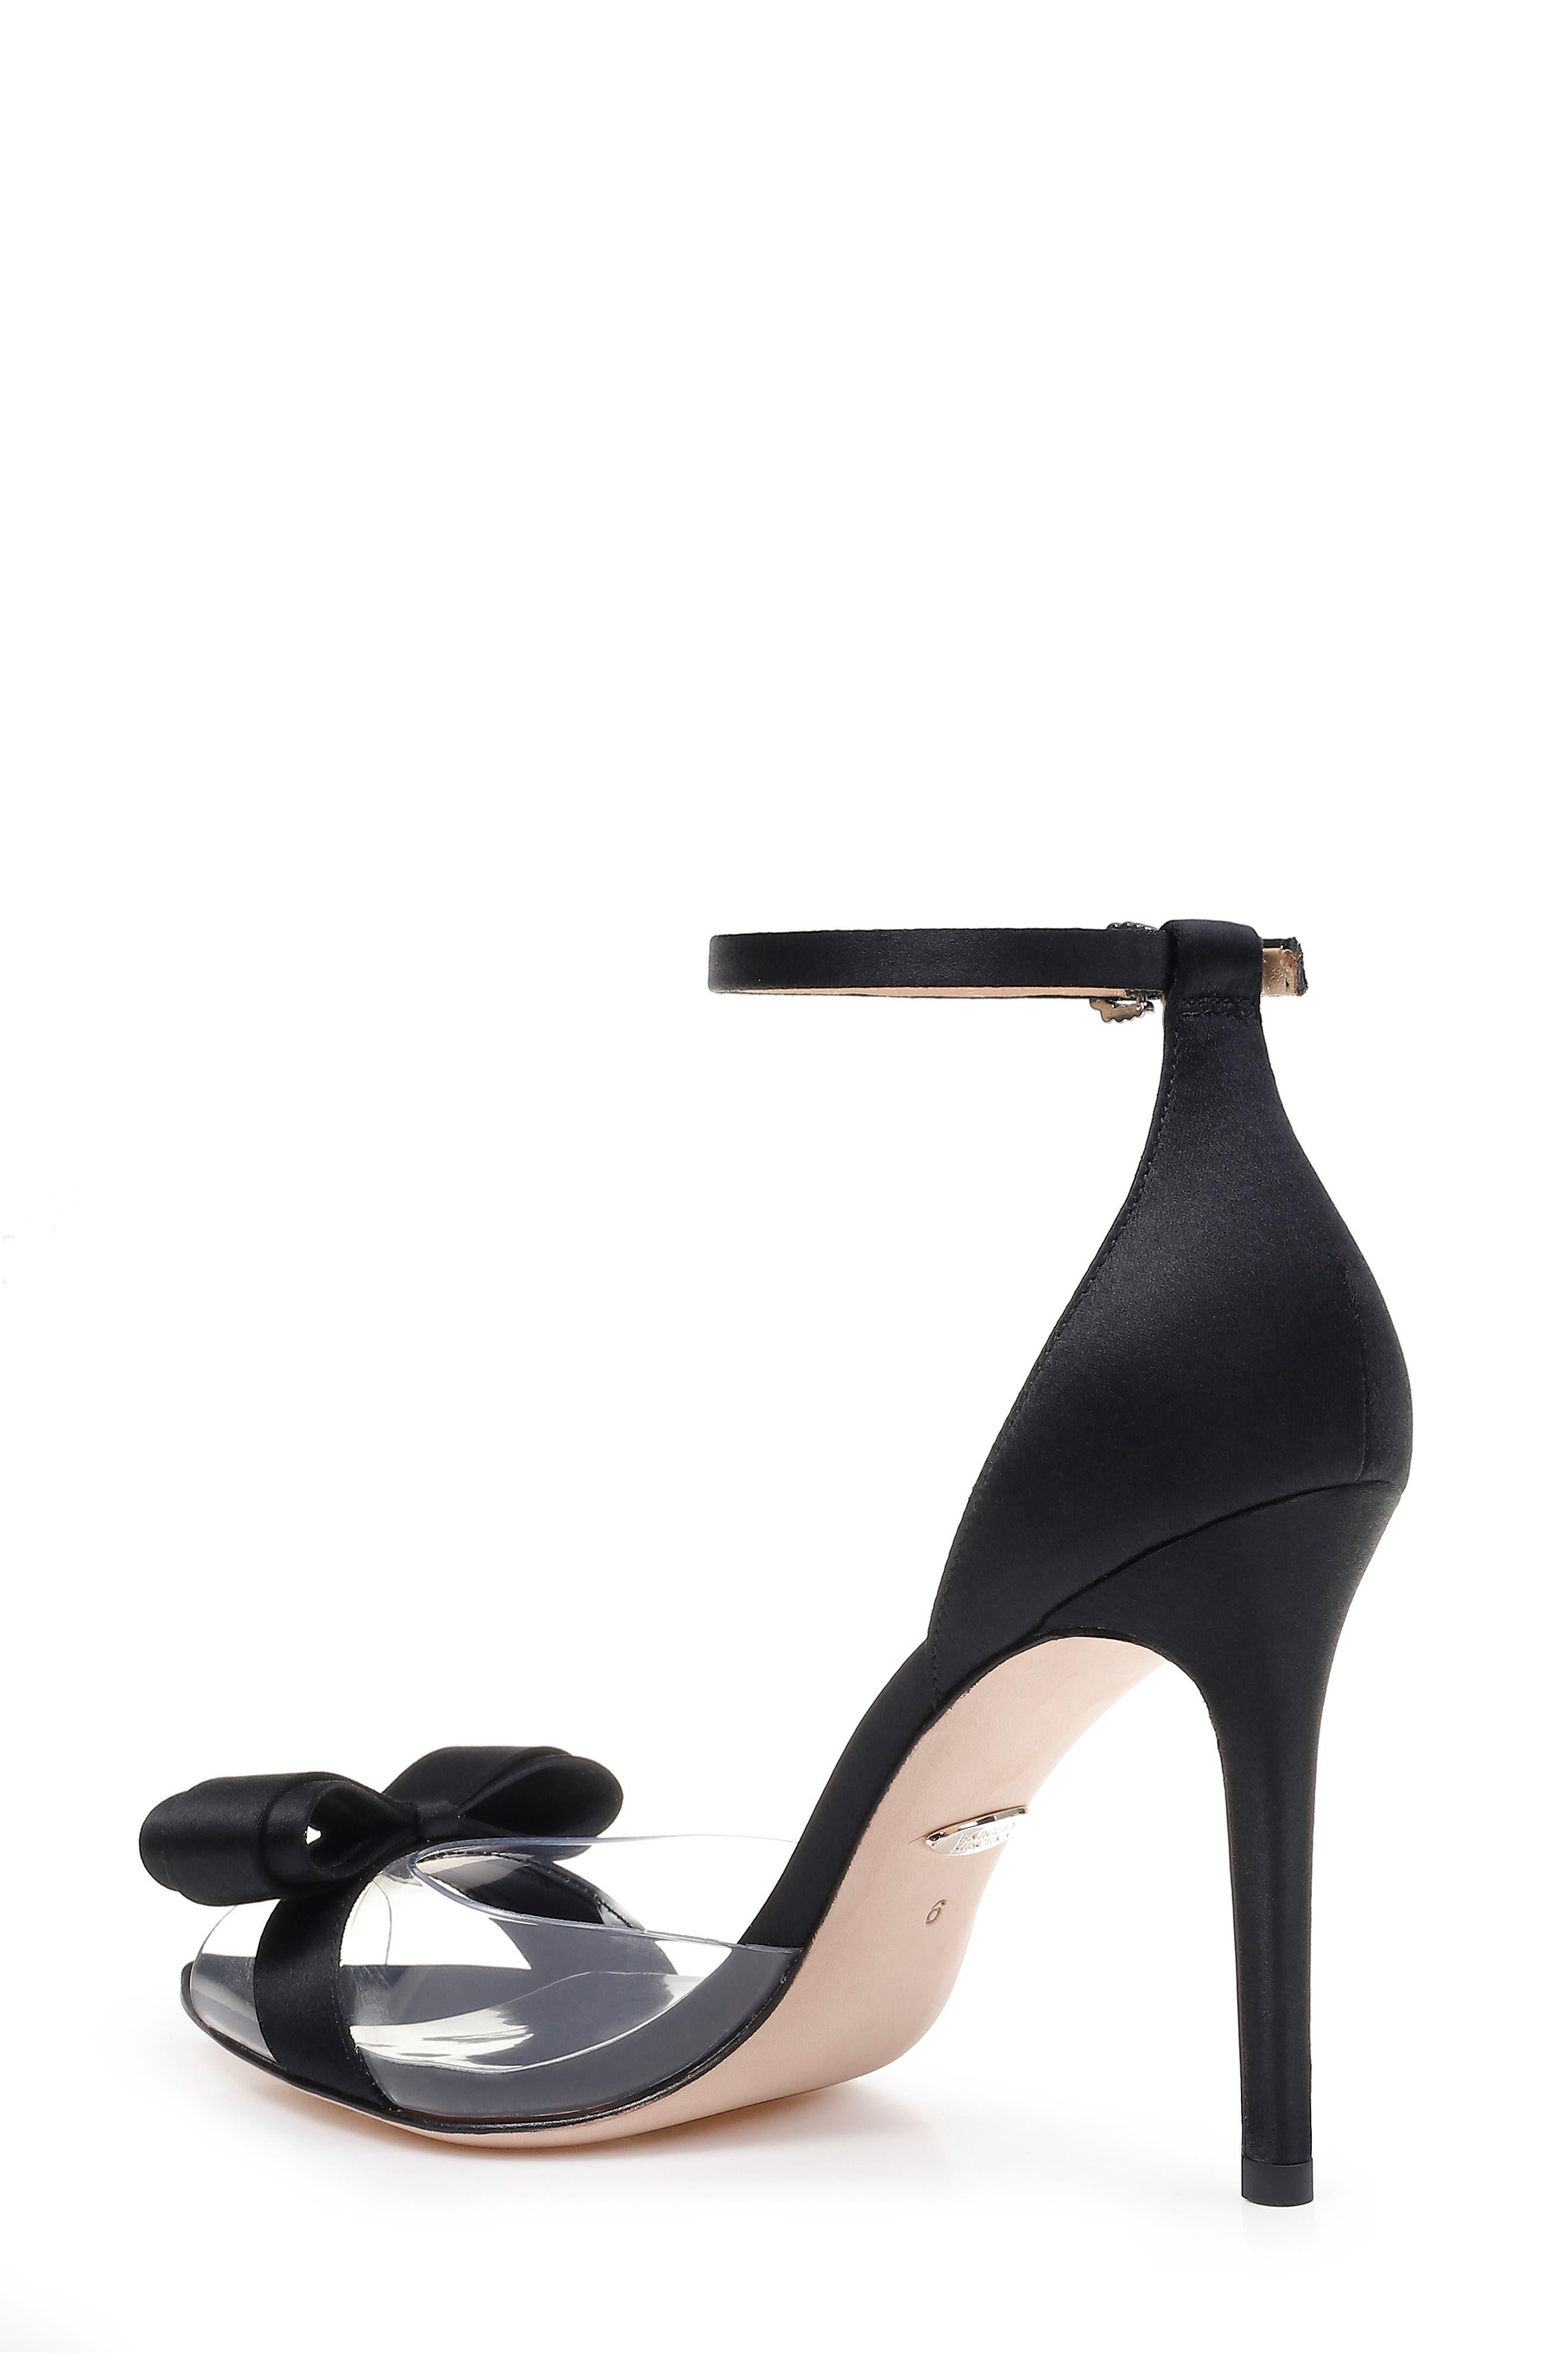 BADGLEY MISCHKA COLLECTION,                             Badgley Mischka Lindsay Ankle Strap Sandal,                             Alternate thumbnail 2, color,                             BLACK SATIN